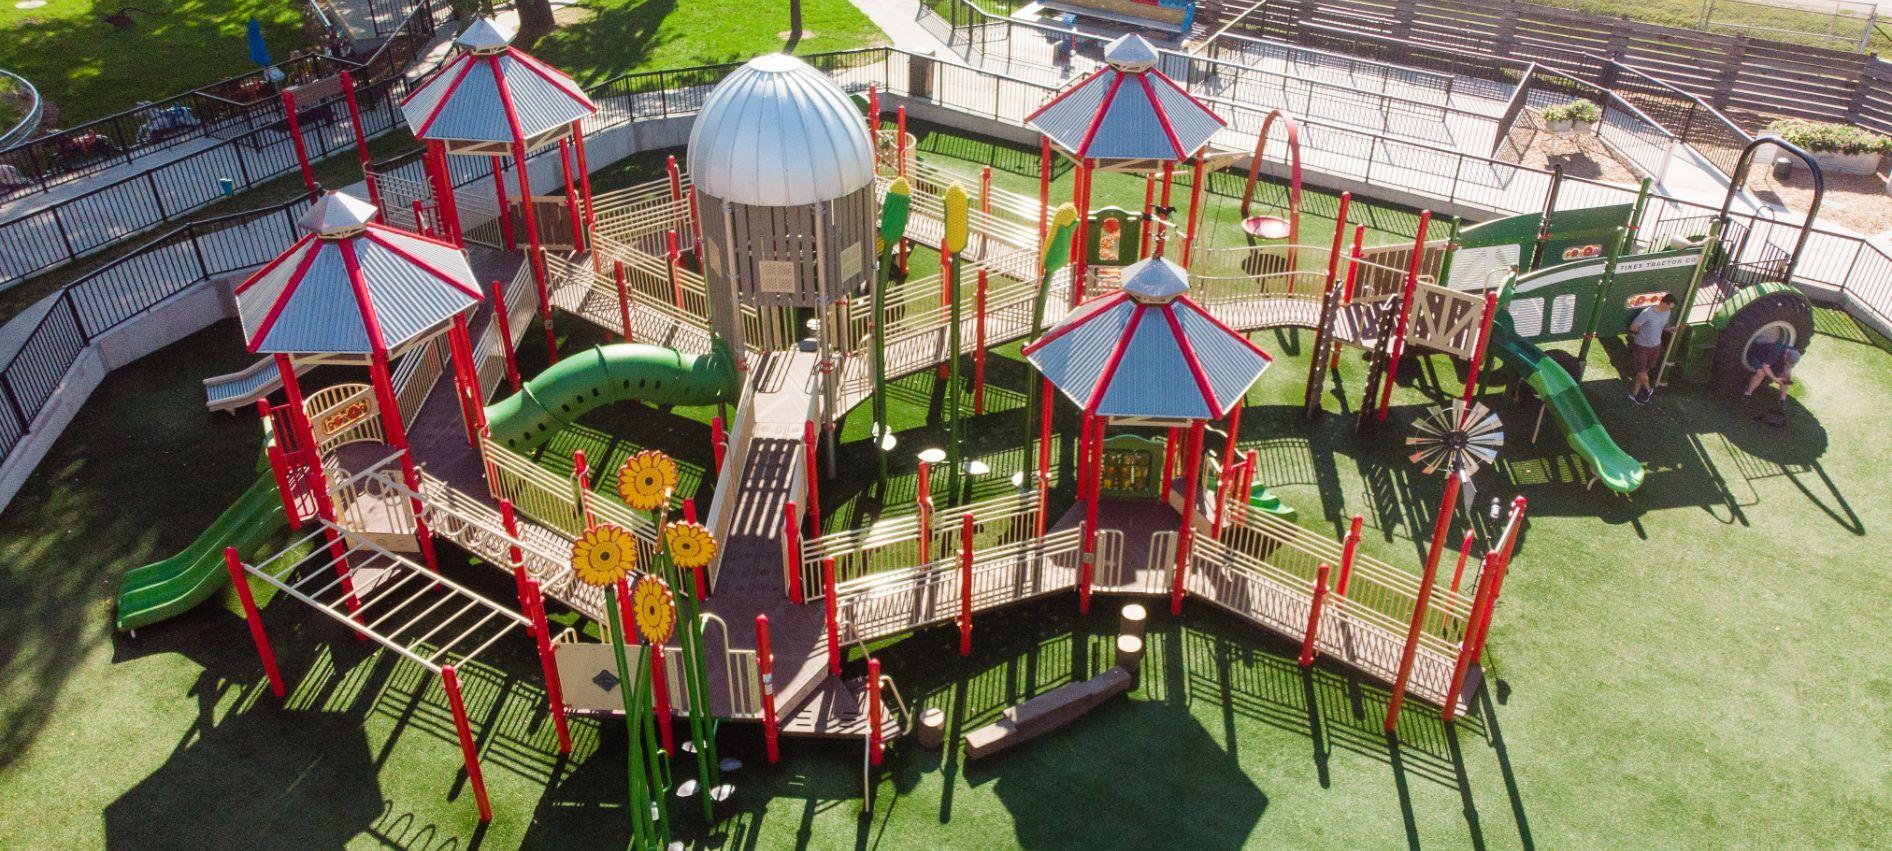 Aerial view of farmland playground equipment